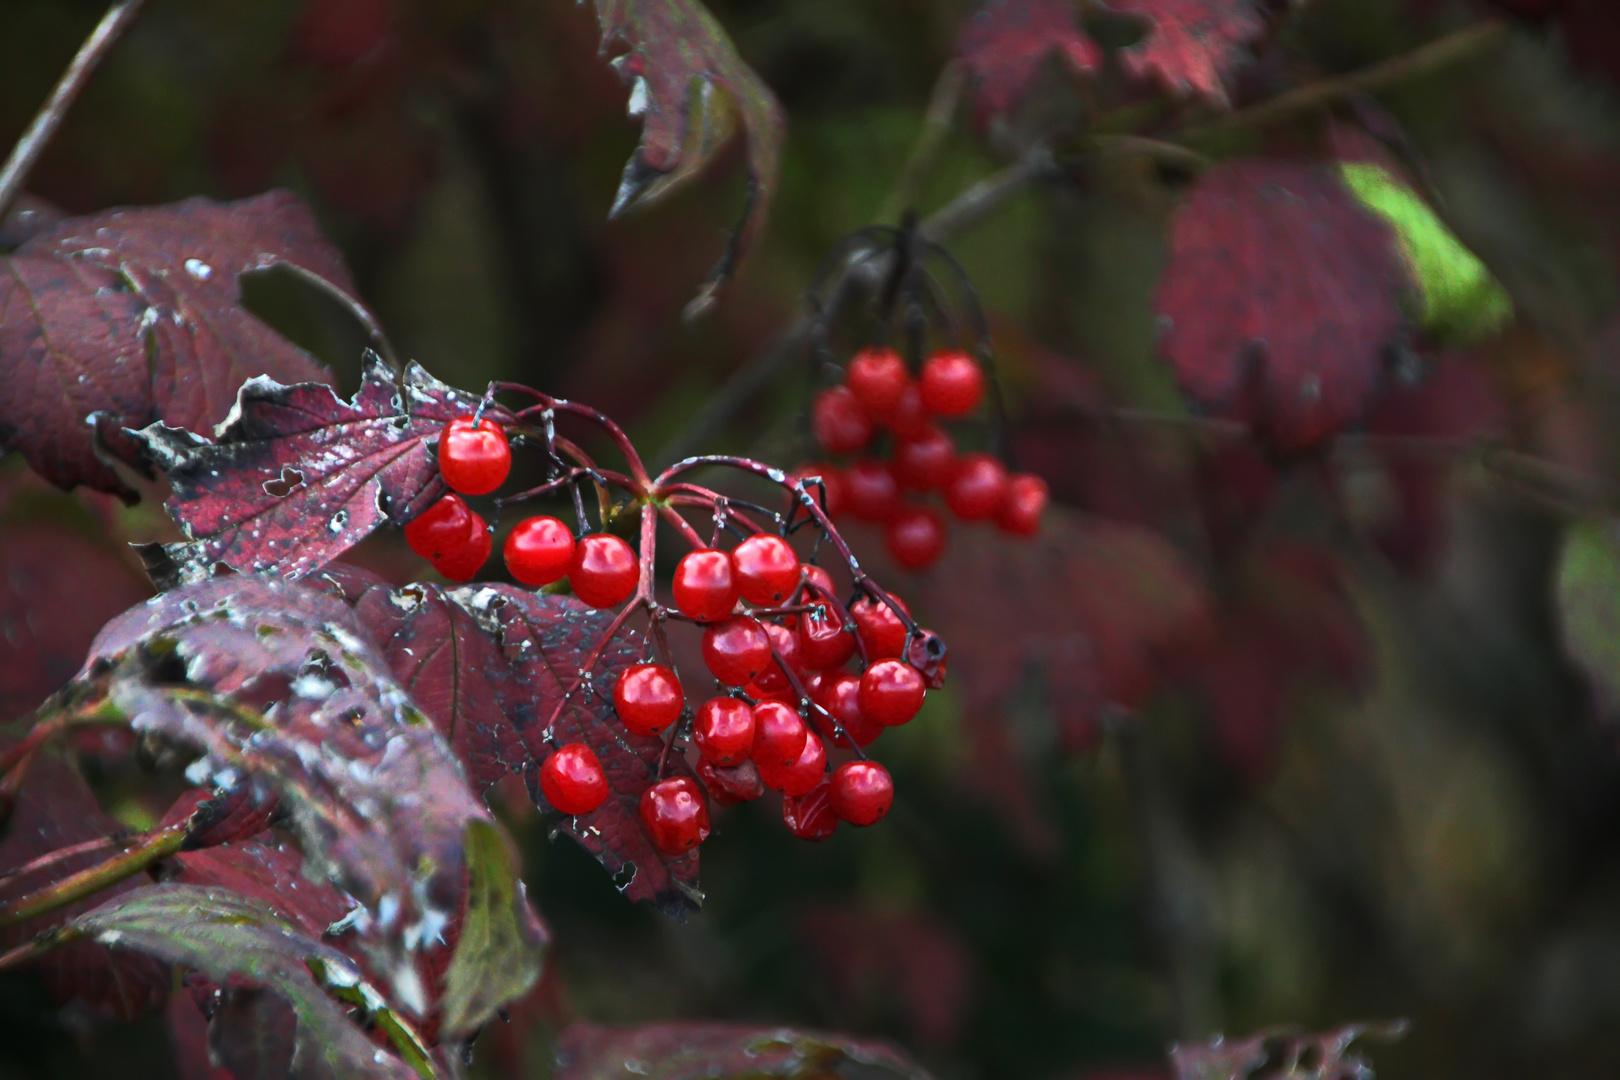 leuchtende Beeren im Herbst